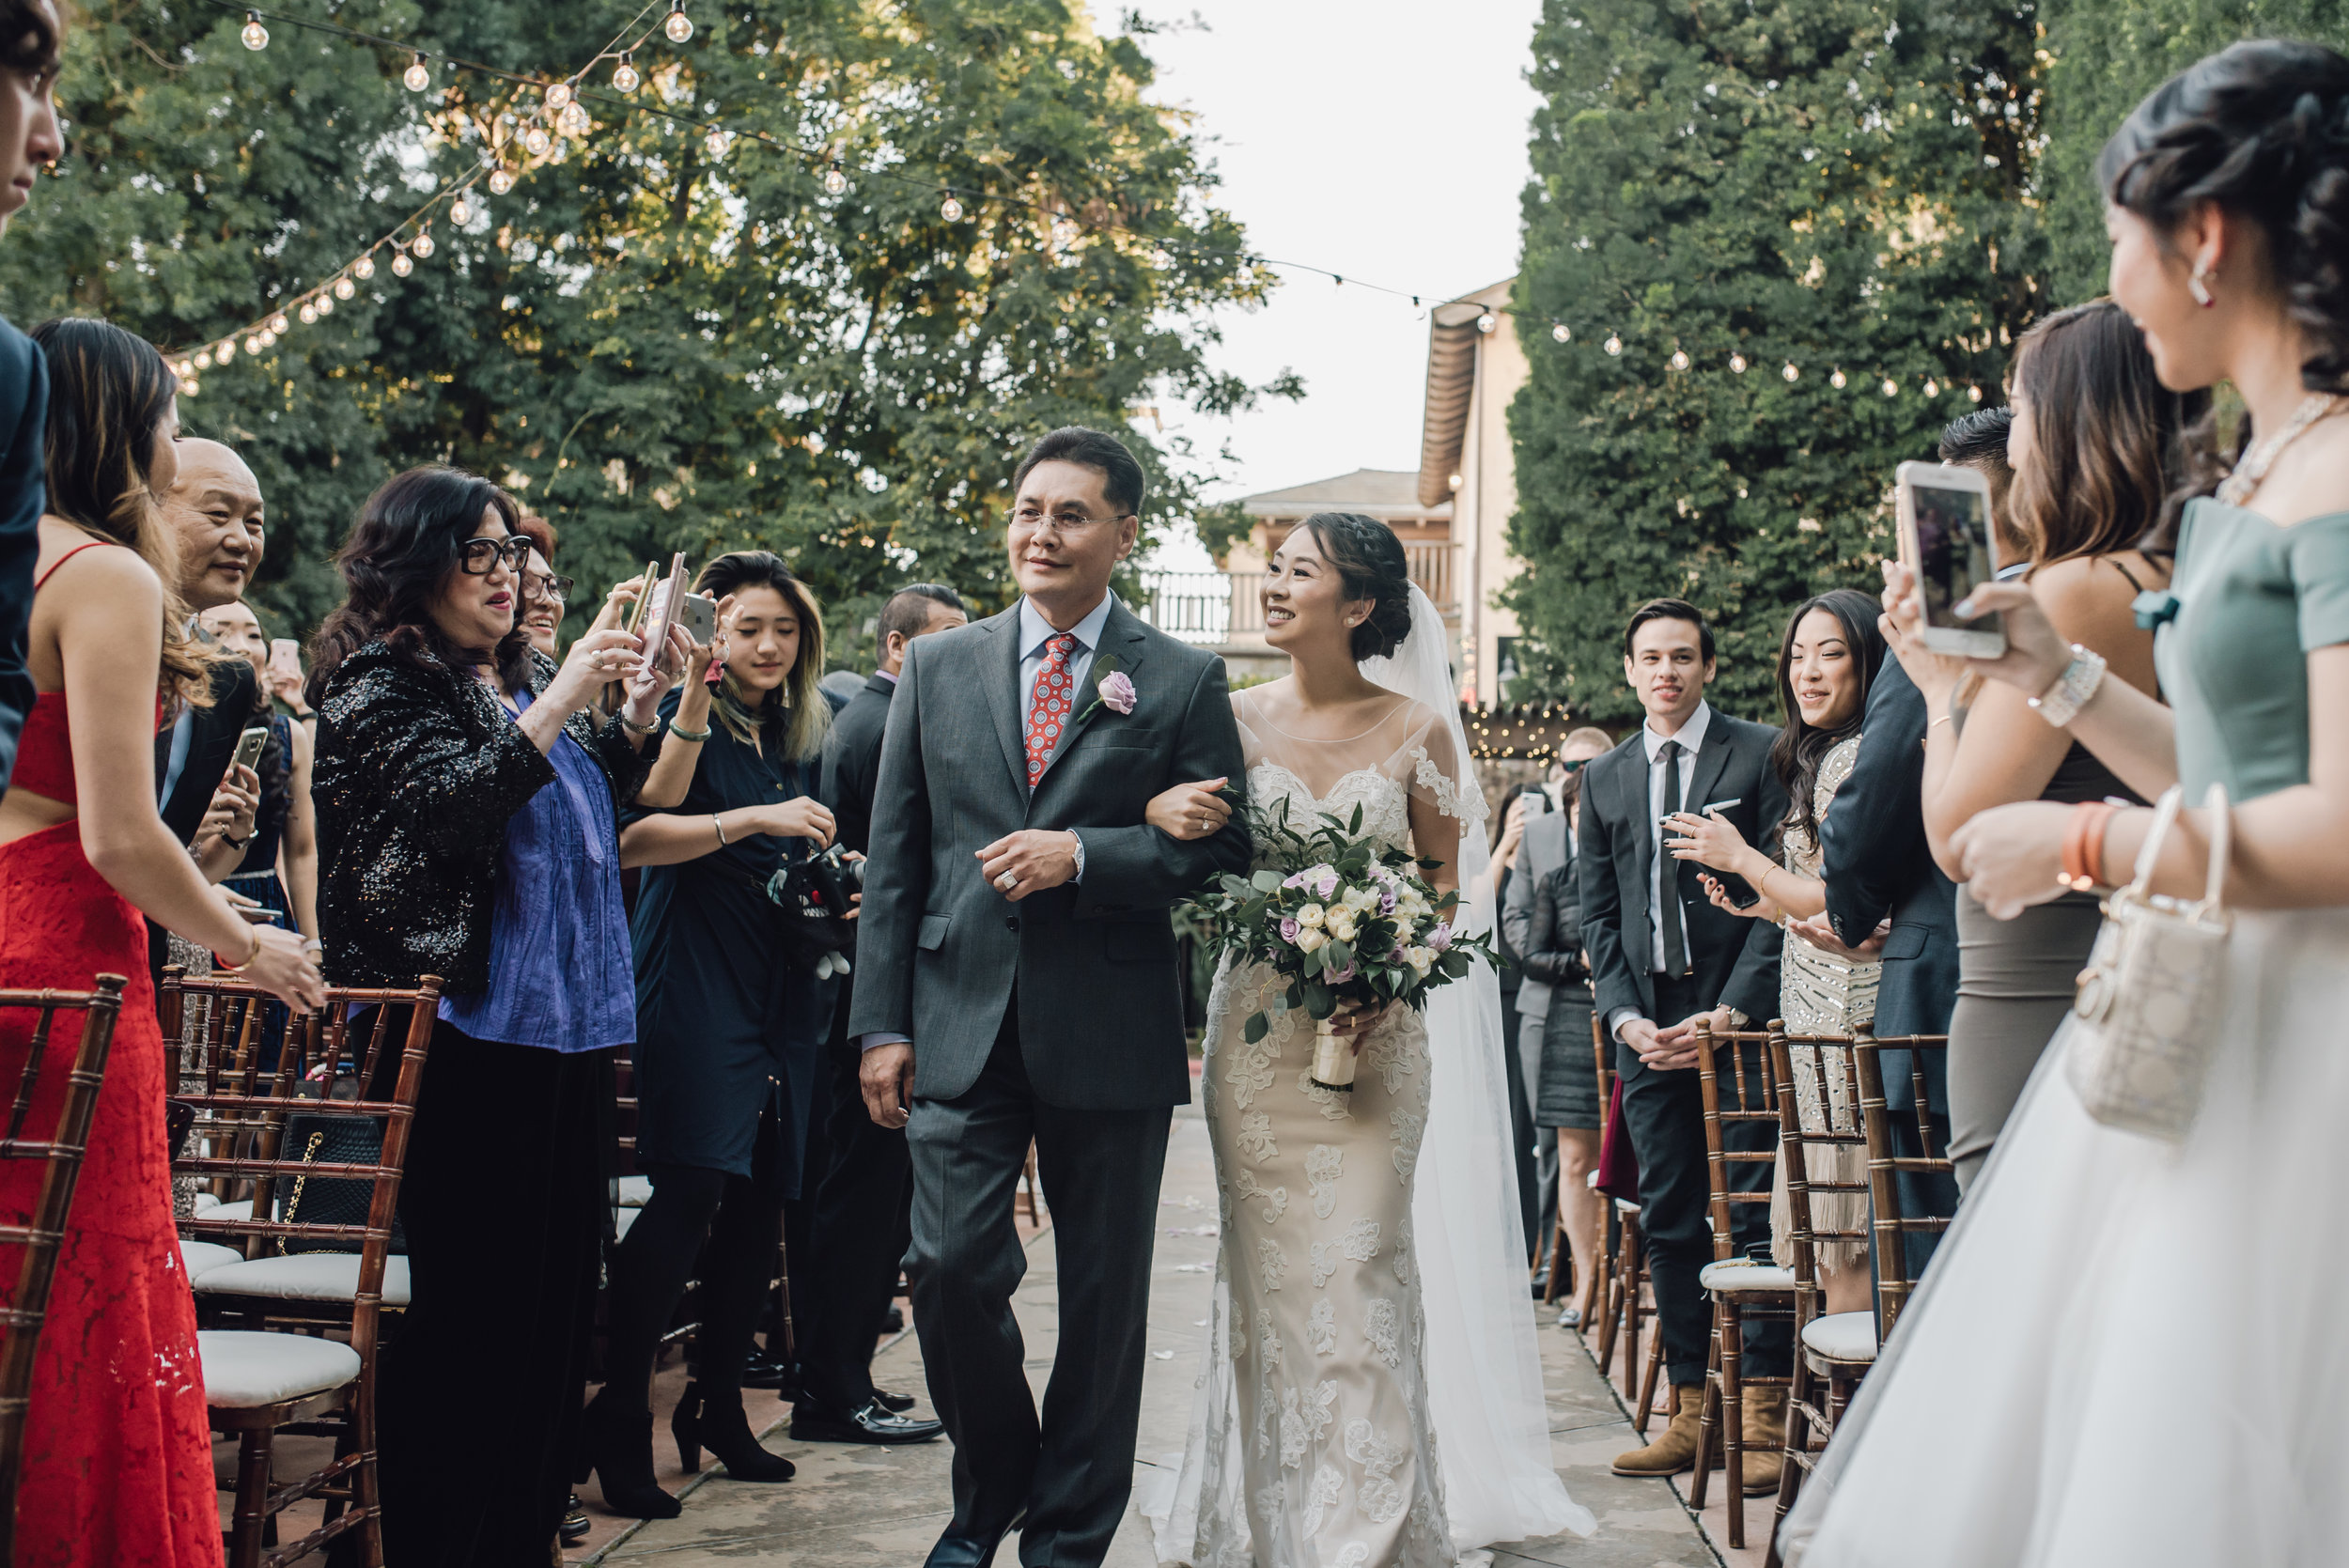 Main and Simple Photography_2017_Weddings_SanJuanCapistrano_J+B-1357.jpg